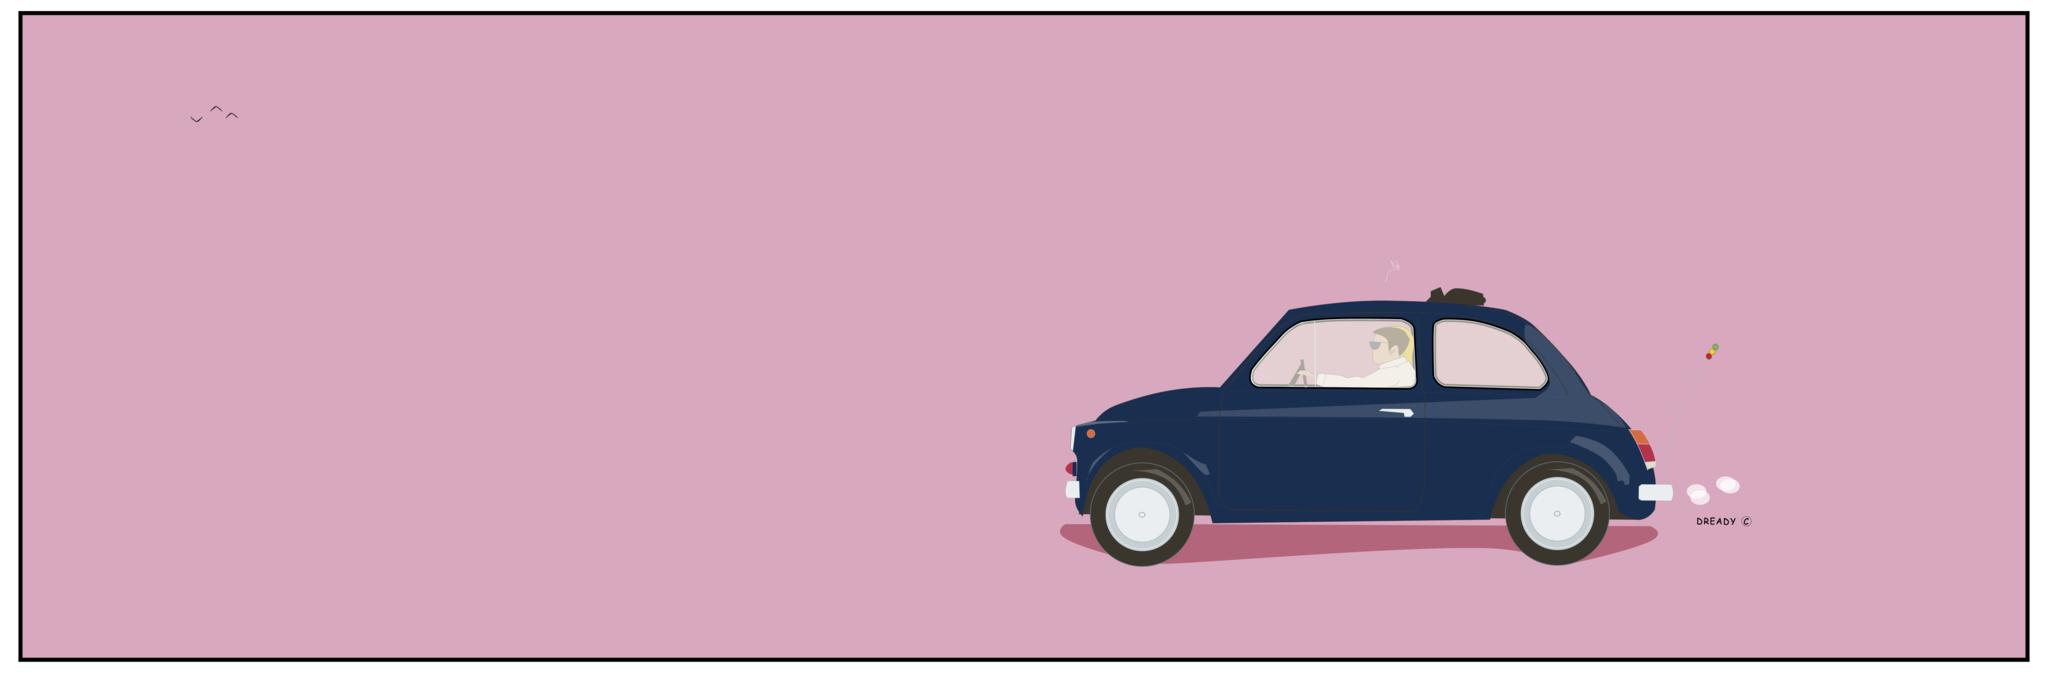 Dready Ciao Mennagio - Fiat 500